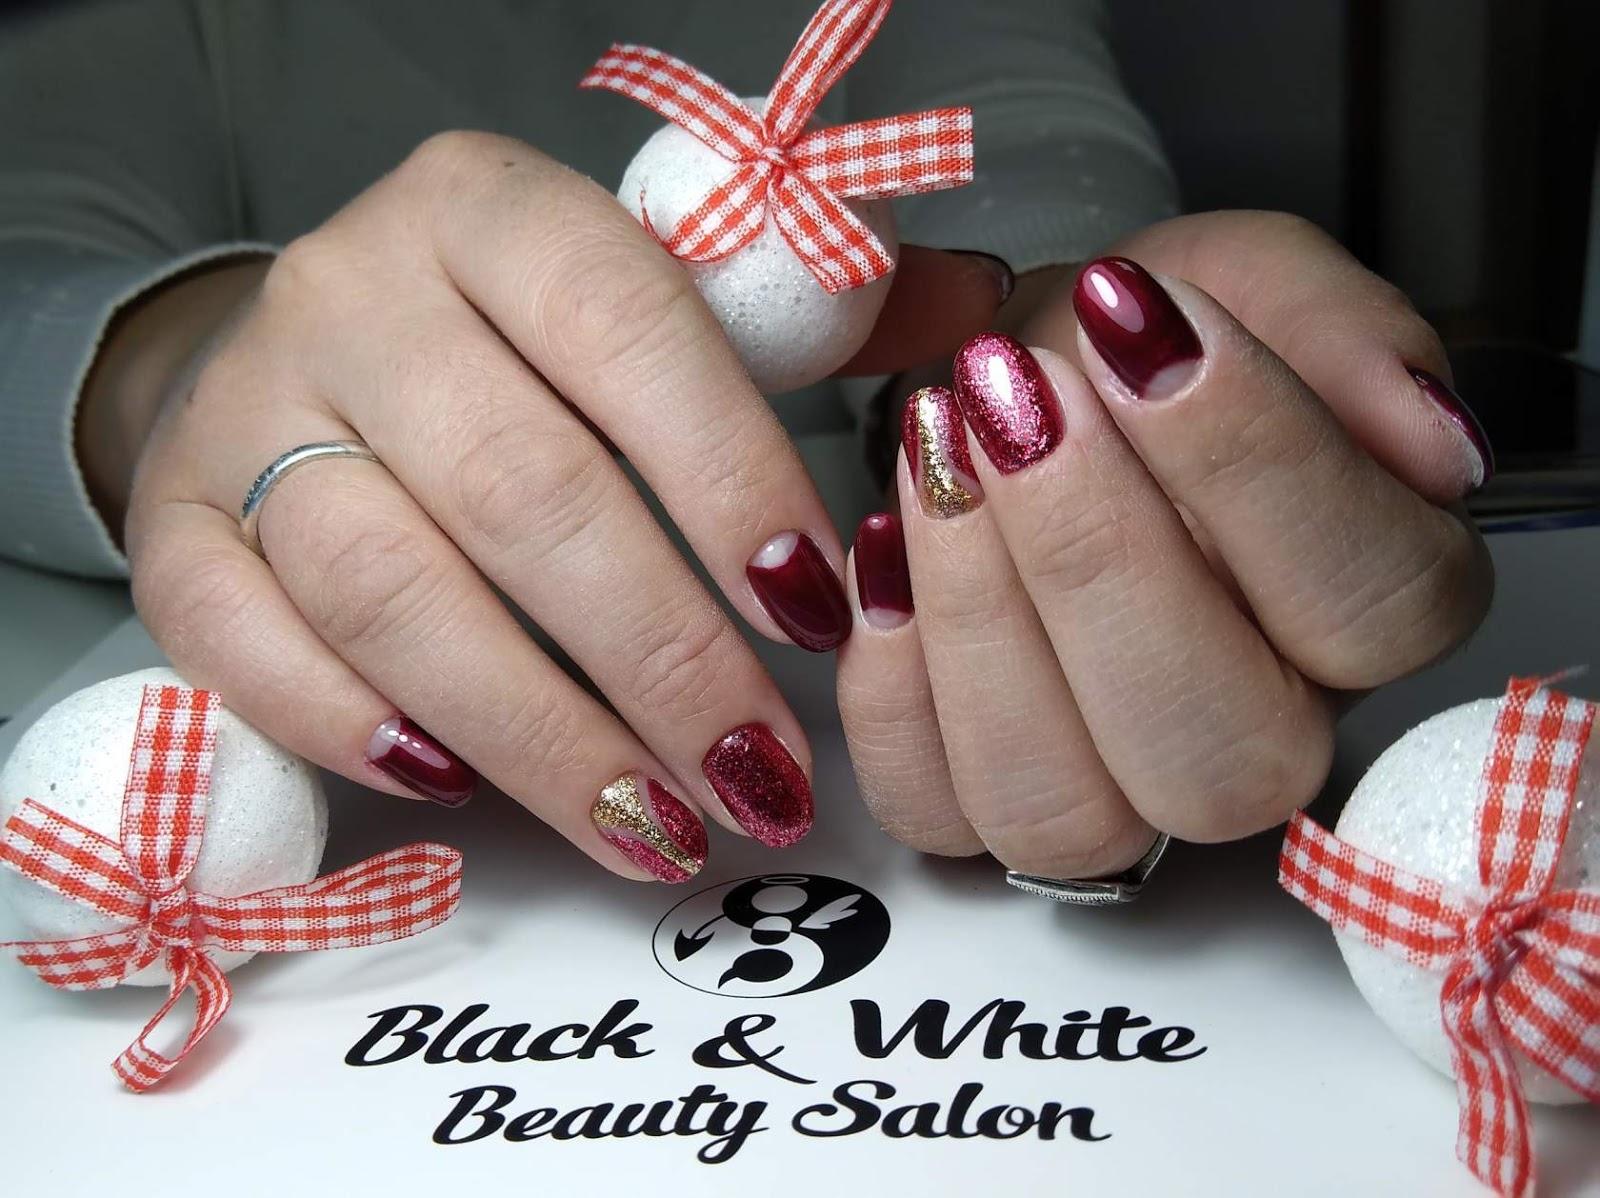 Black & White Nails Art Disign: Nail Salon Williamsburg Brooklyn